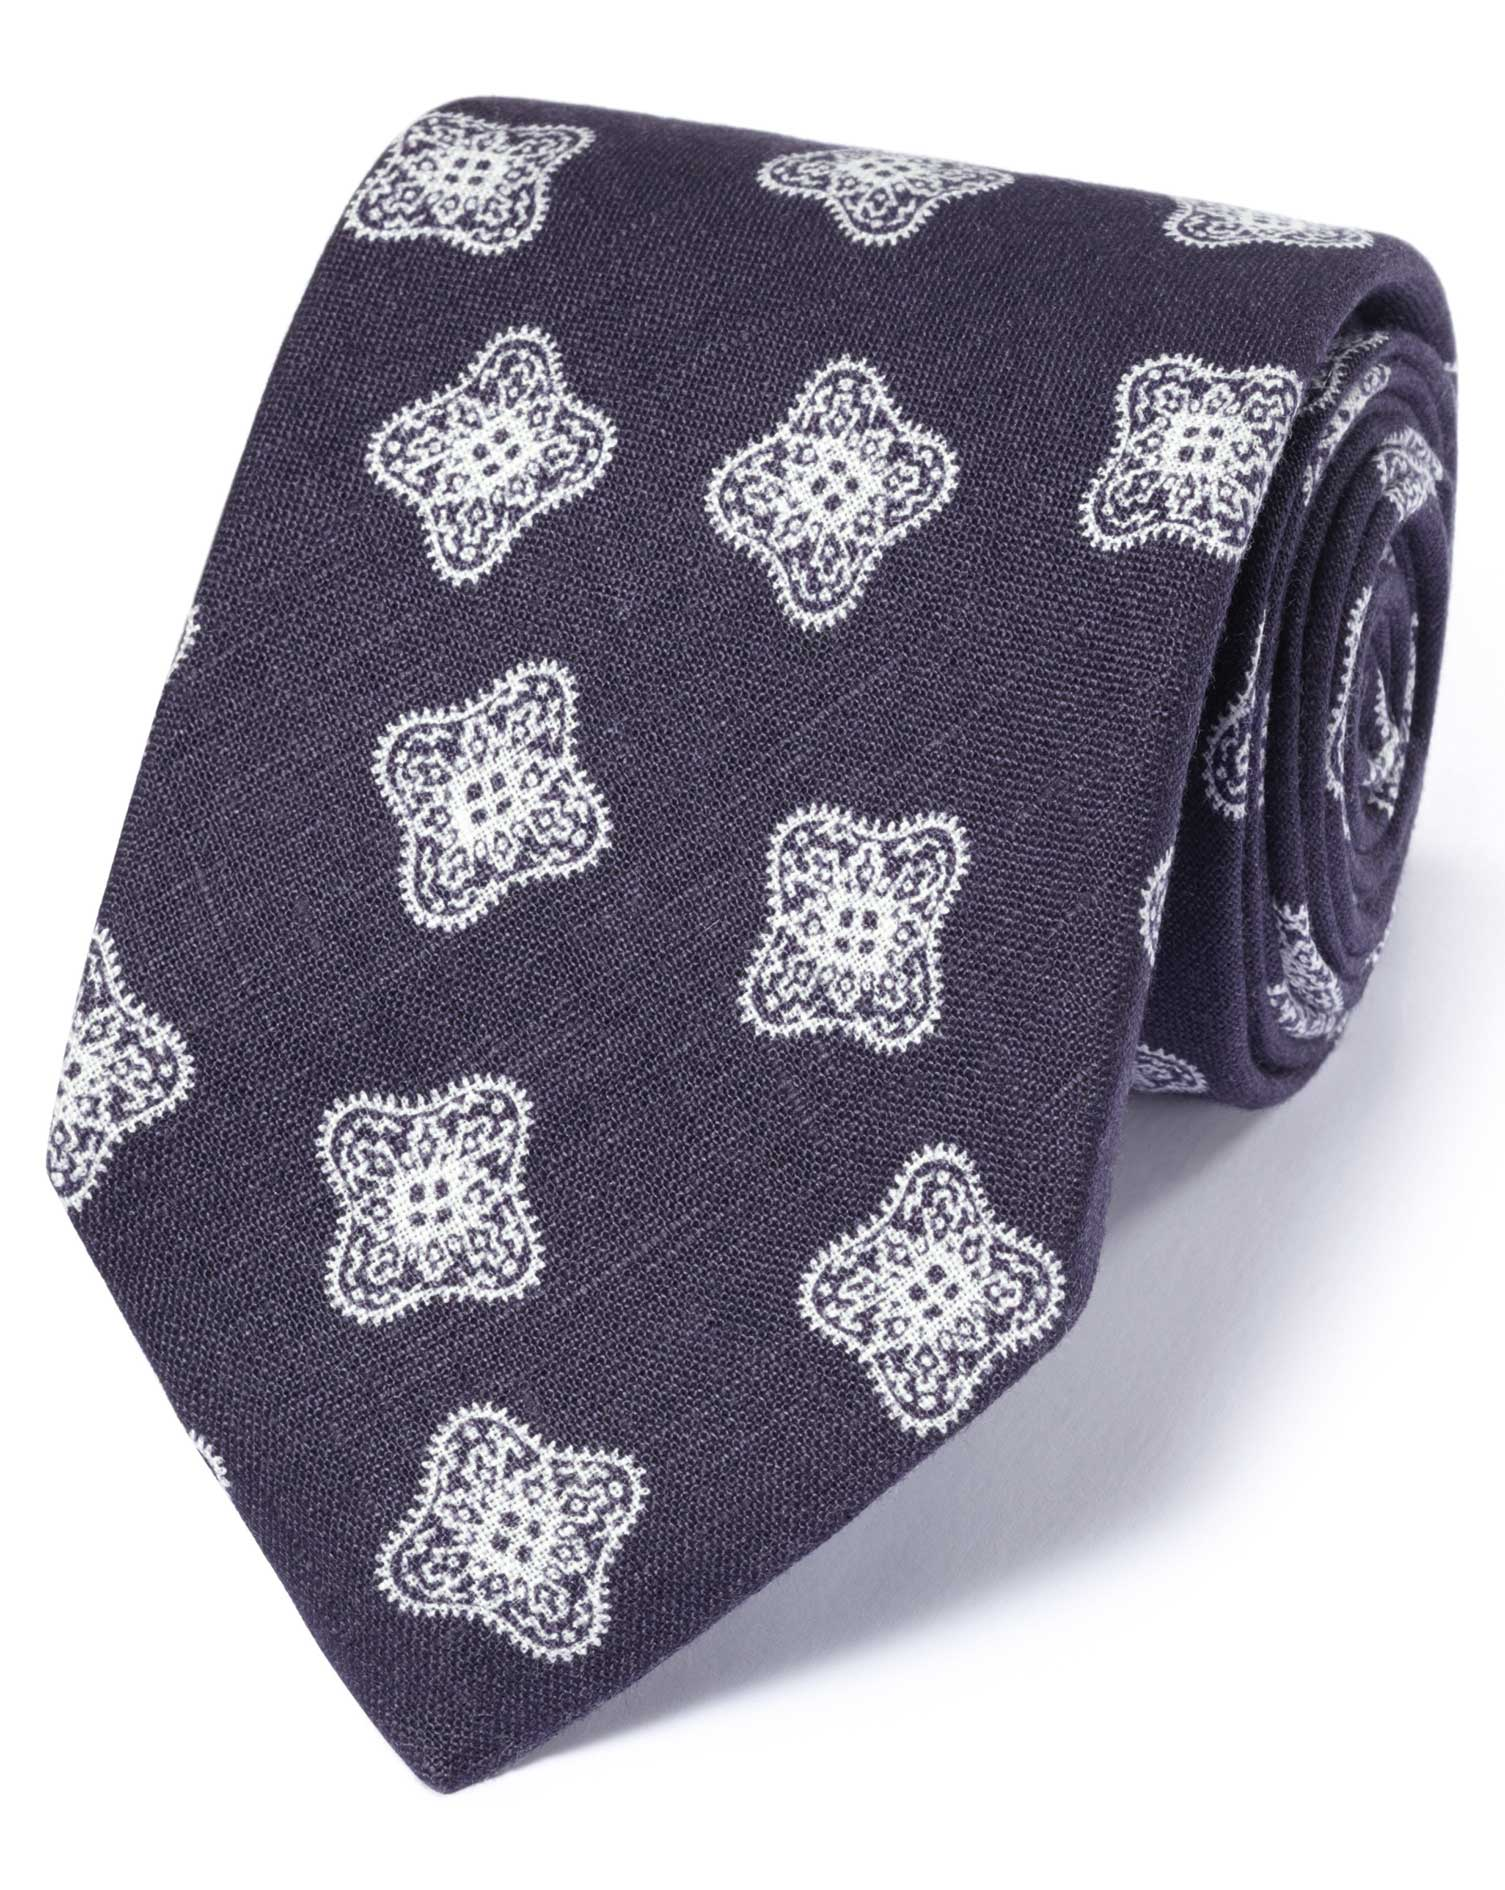 cravate de luxe bleu marine m daillon en lin anglais charles tyrwhitt. Black Bedroom Furniture Sets. Home Design Ideas